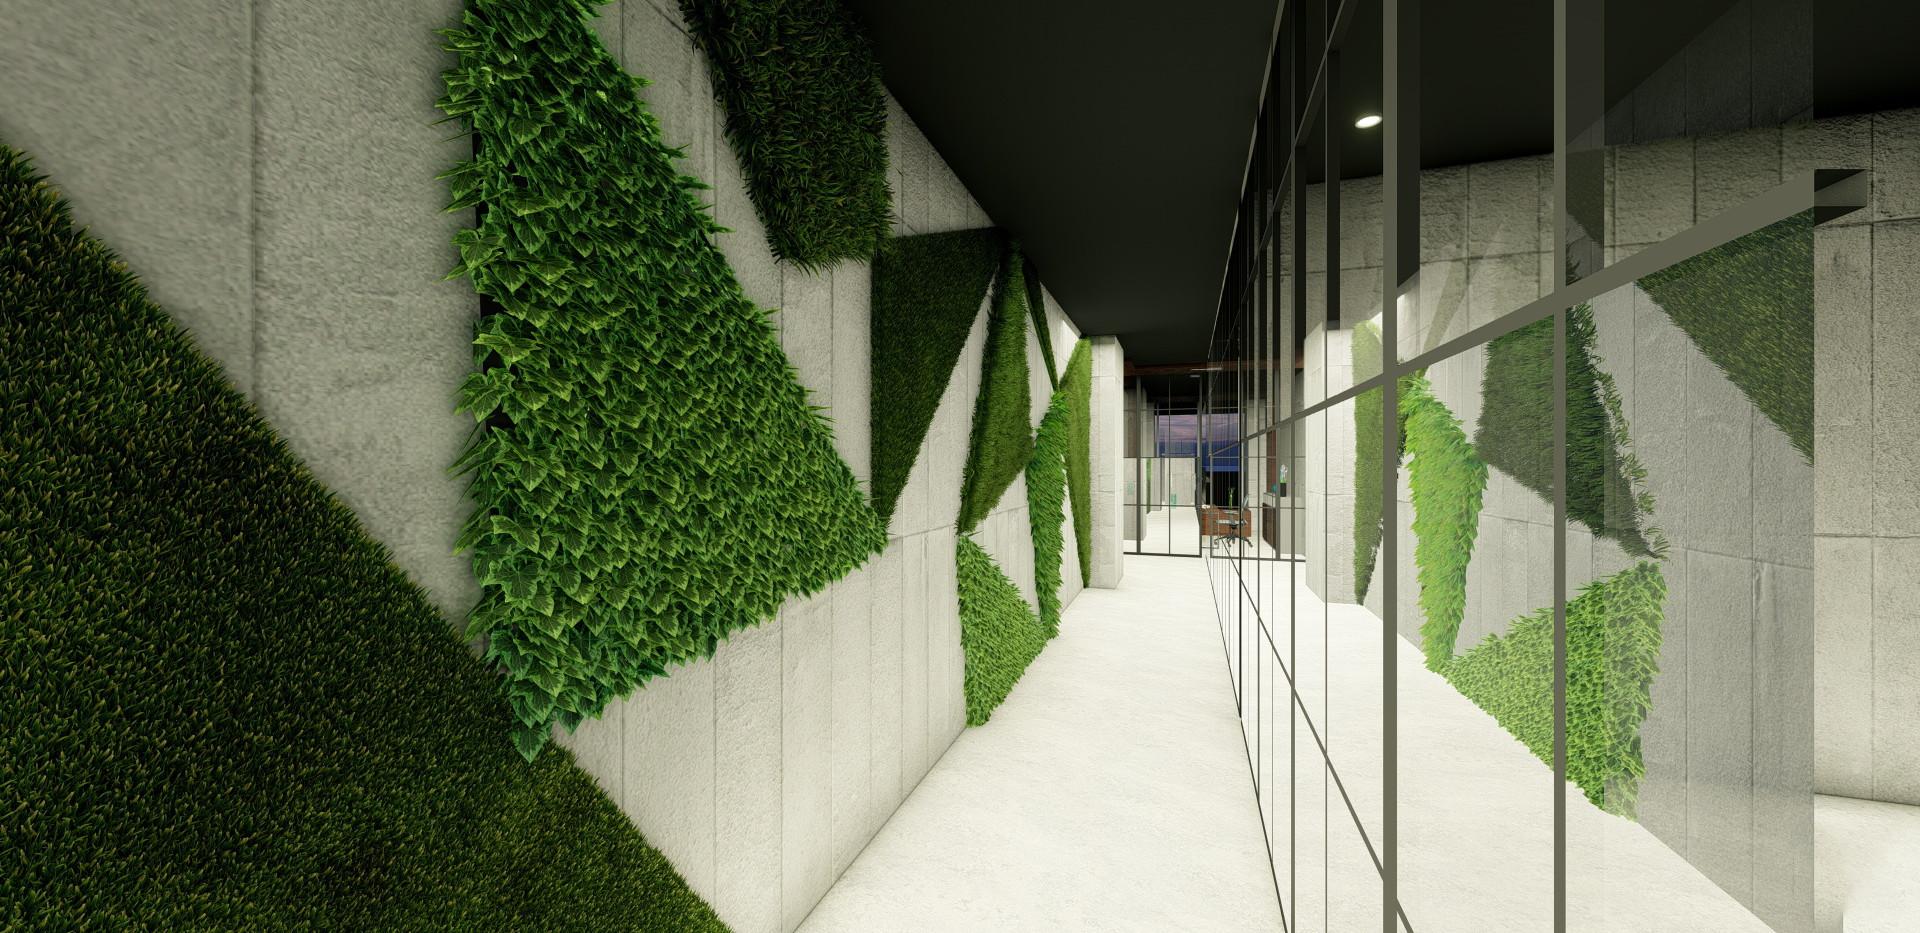 Office Hall - Green Wall